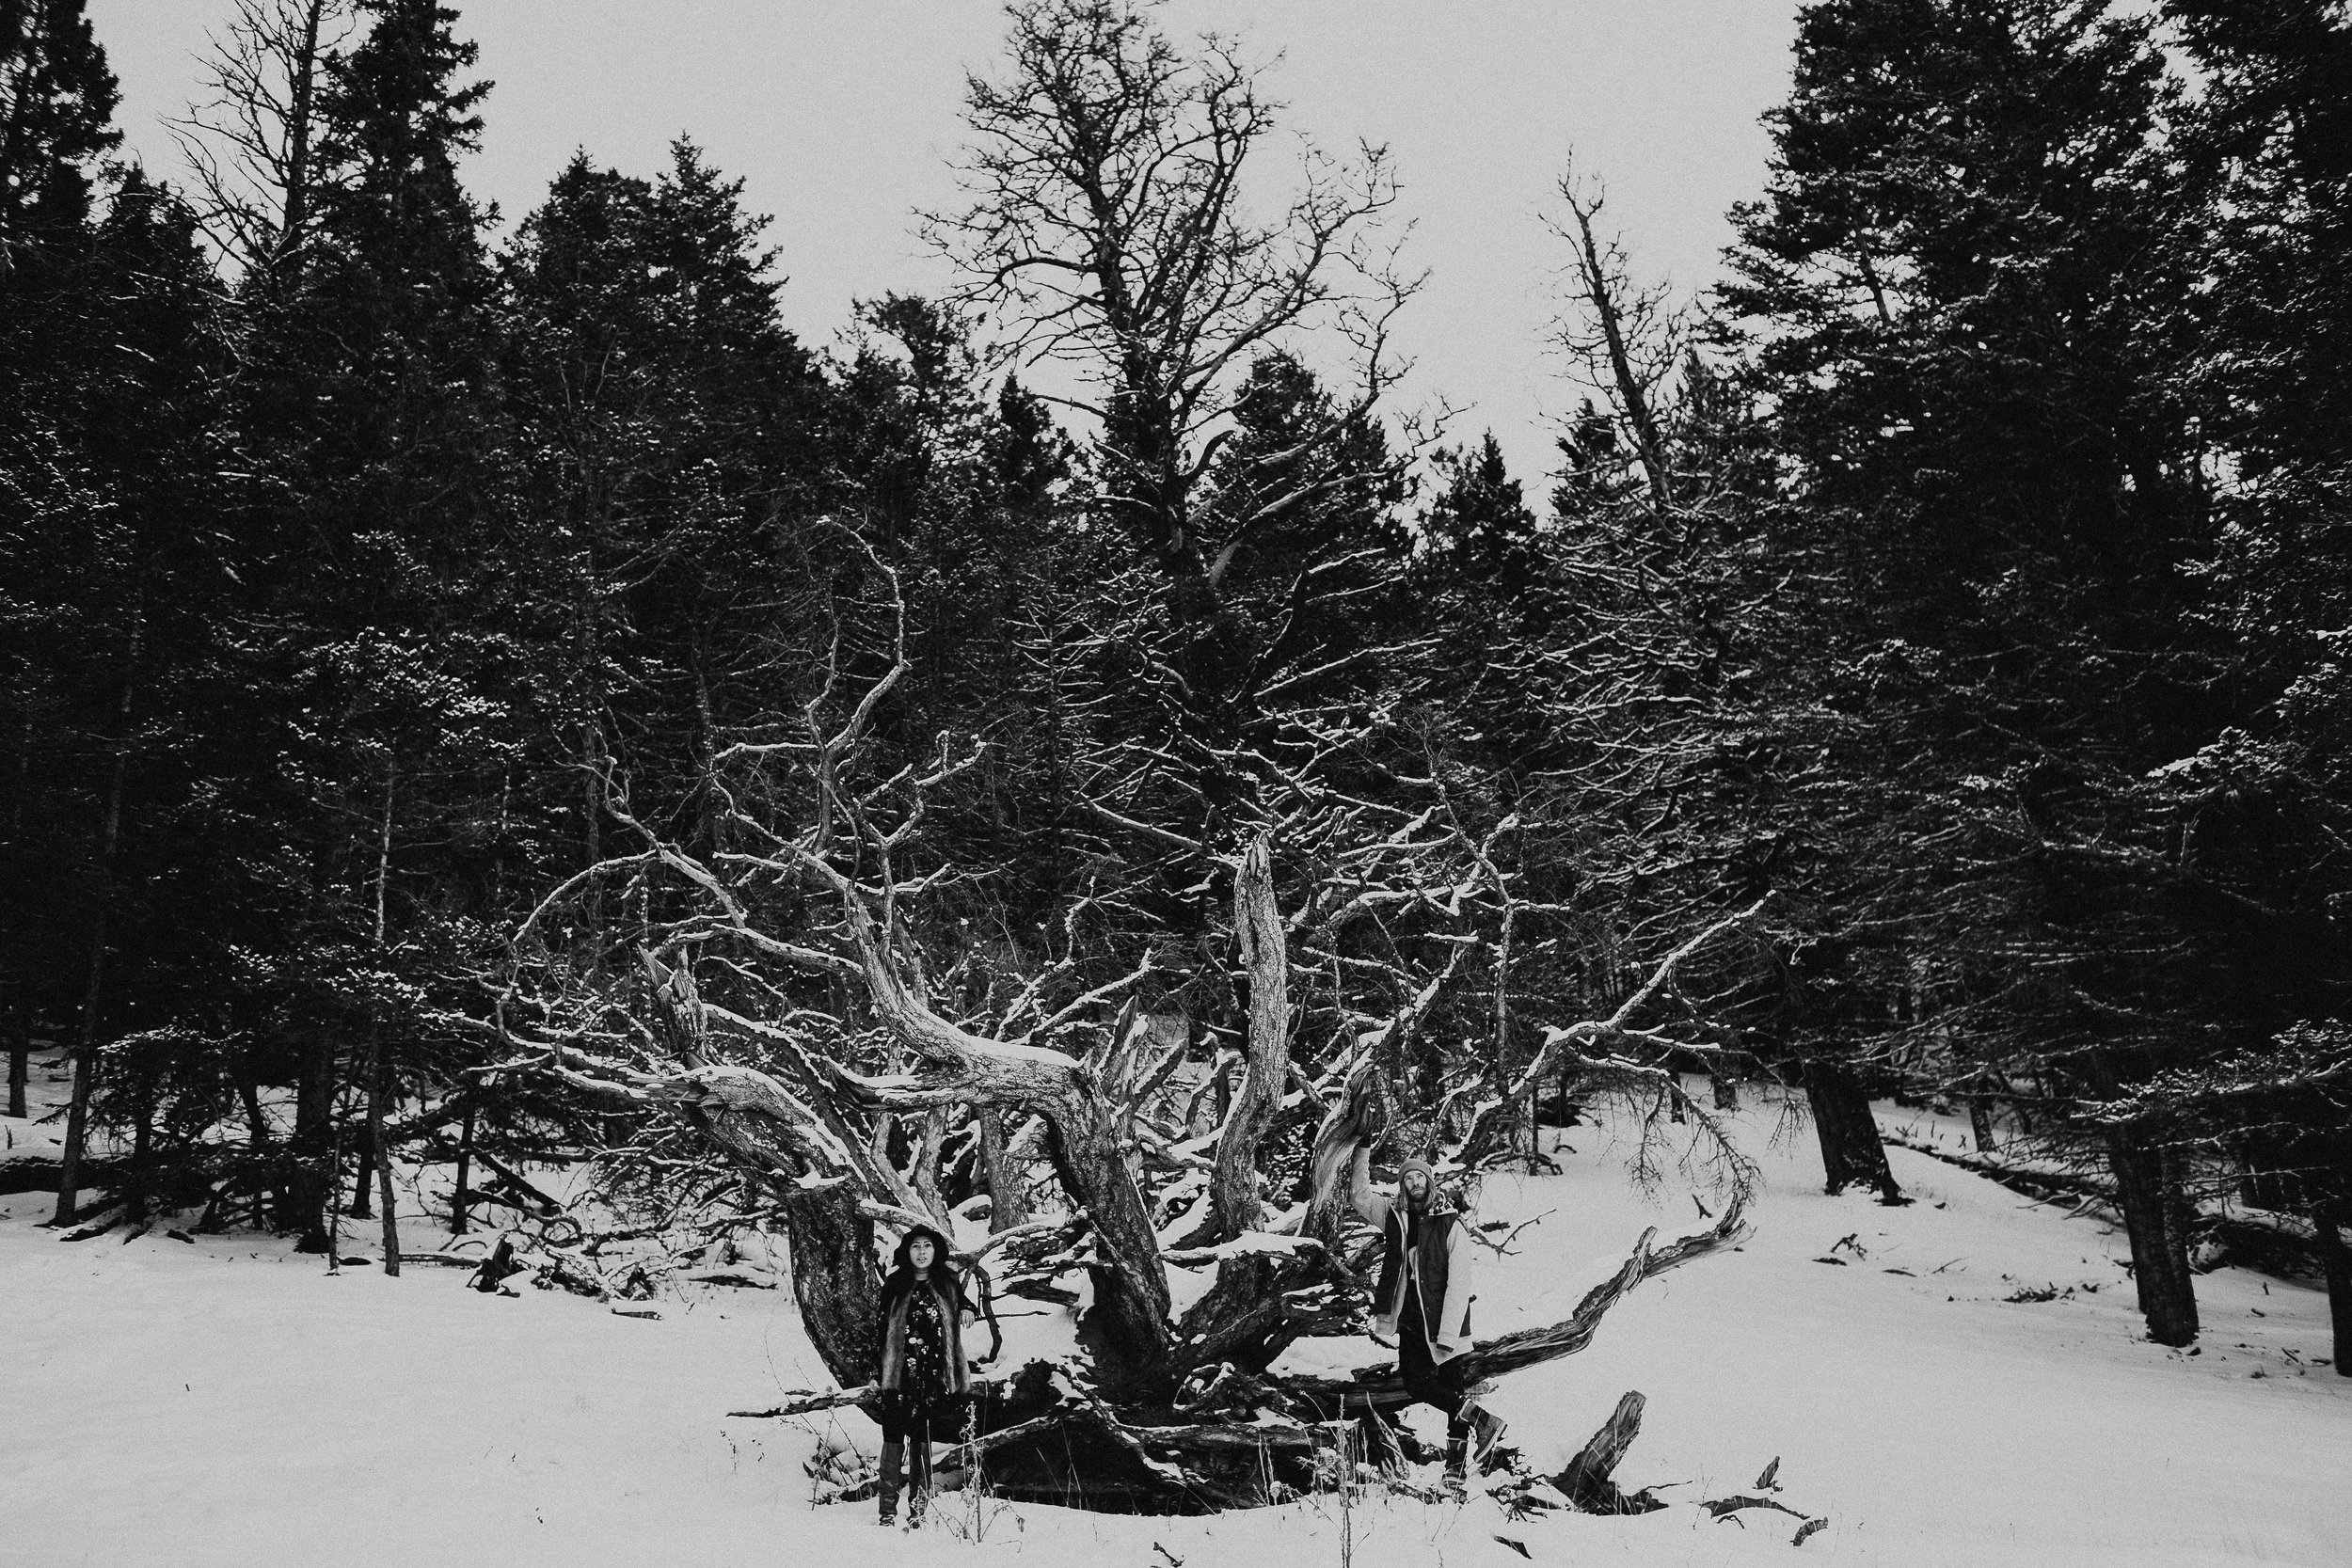 Banff Engagement Photographer - Winter Mountain Adventure Engagement Session - Michelle Larmand Photography-073